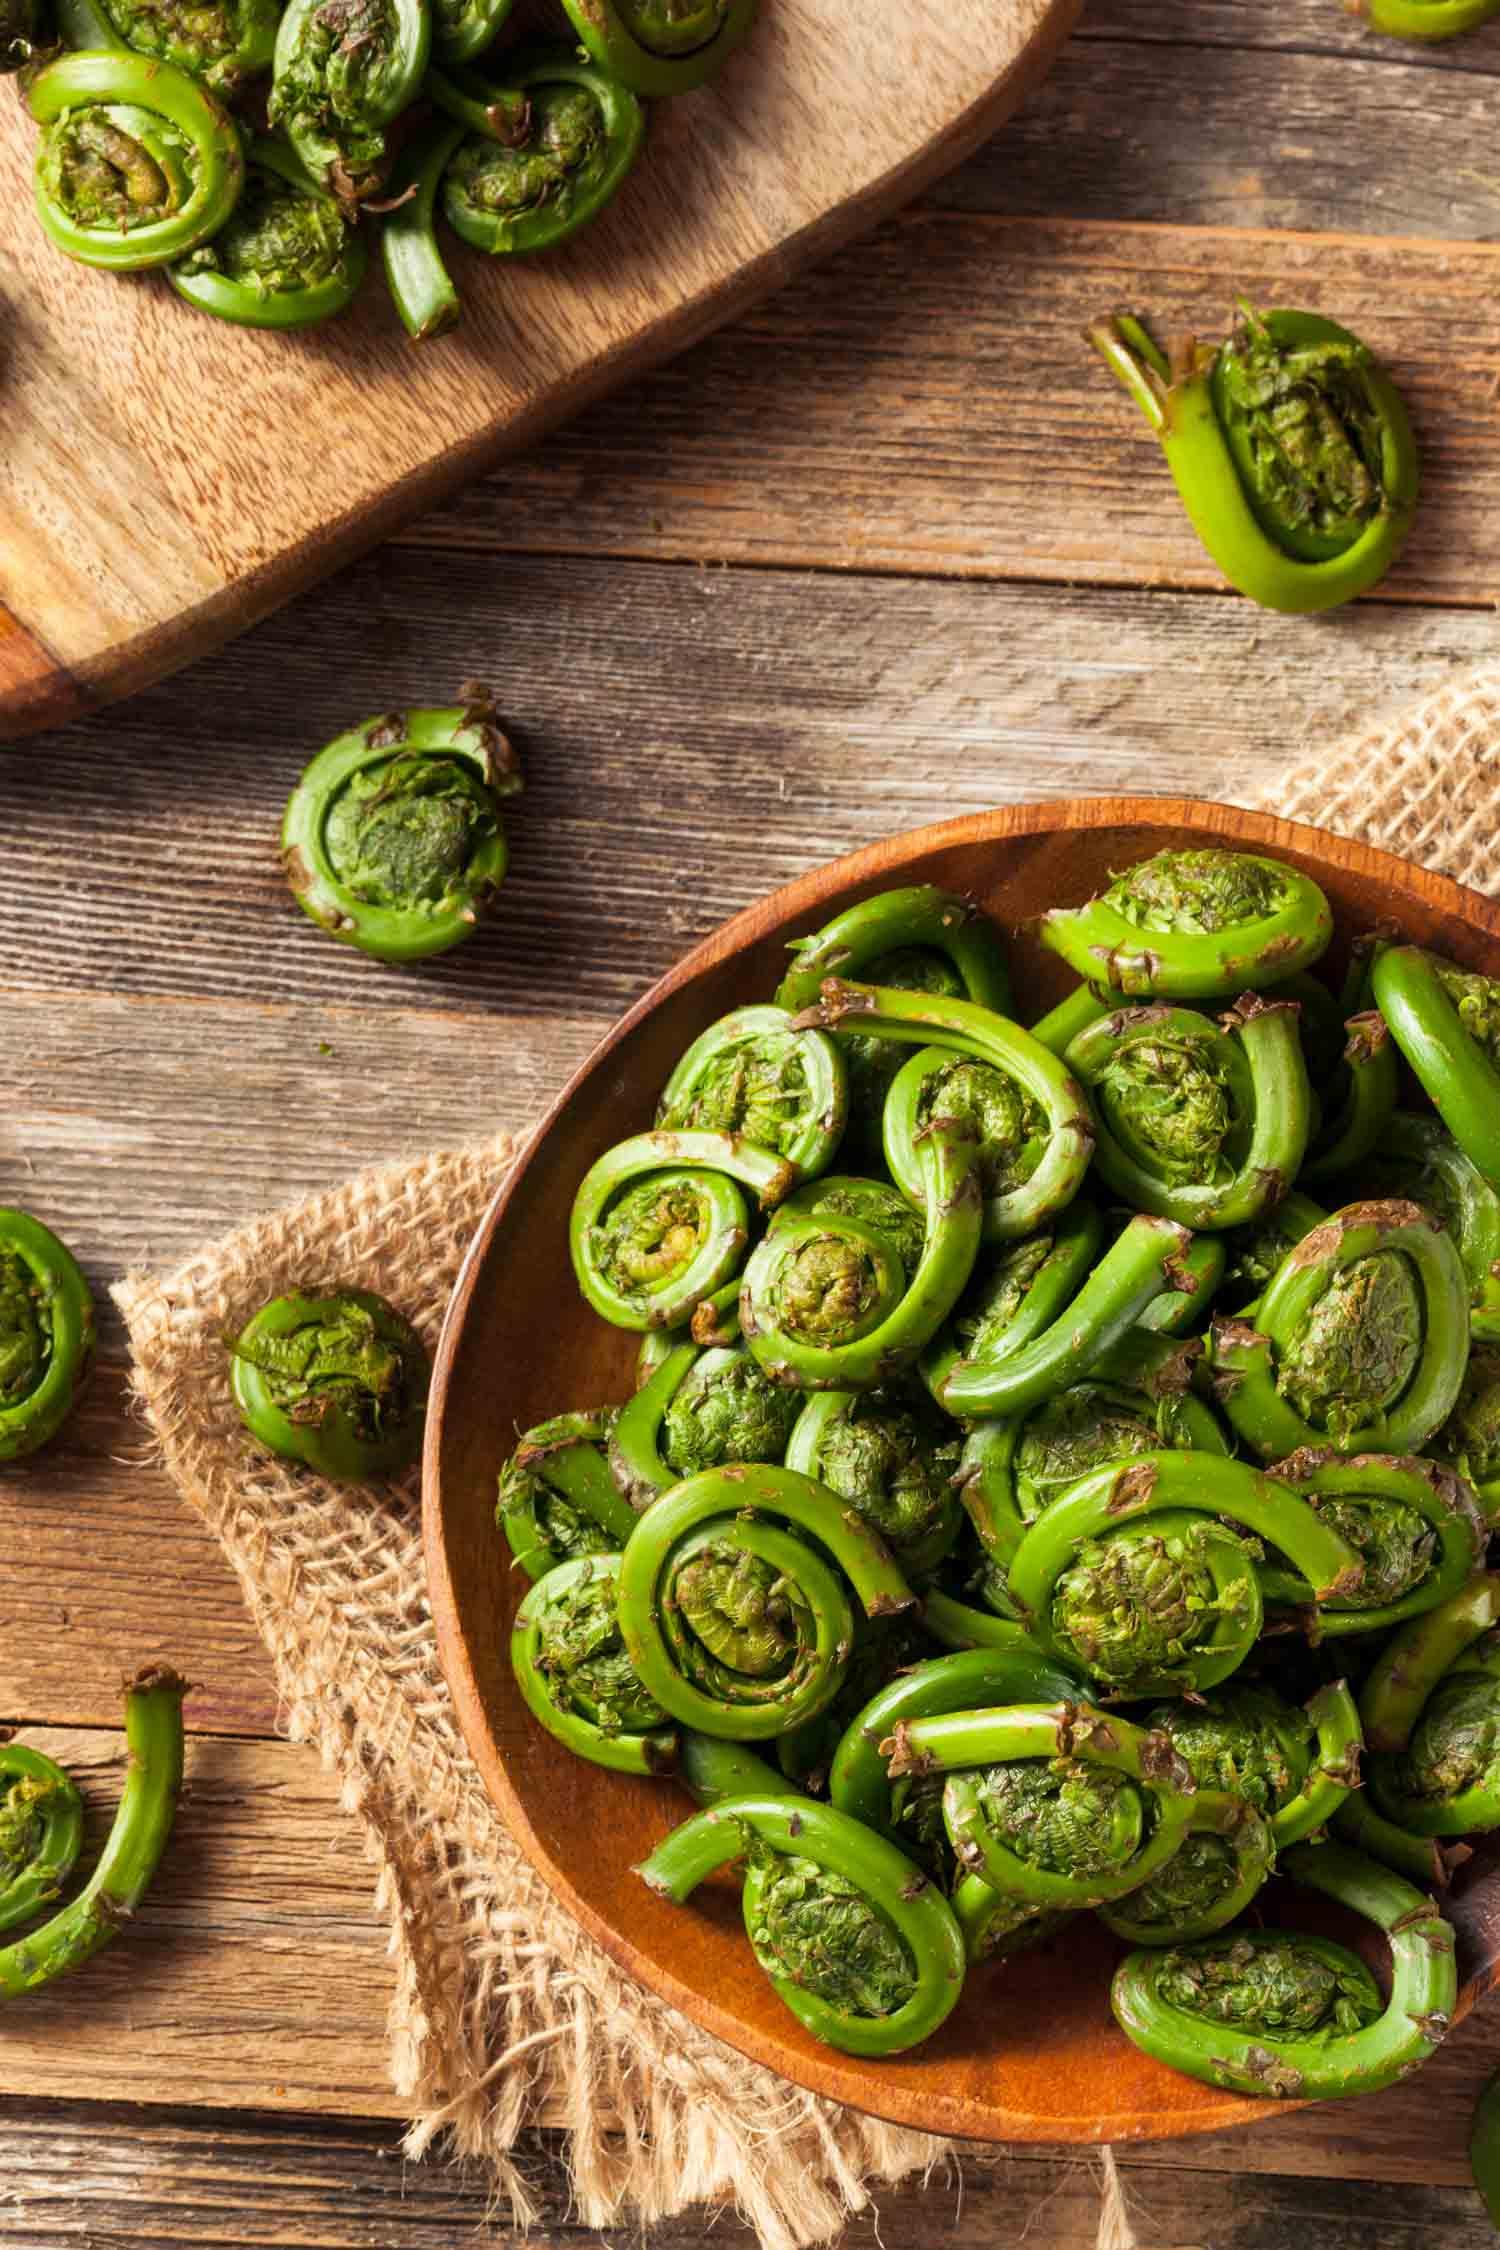 Raw Organic Green Fiddlehead Ferns Ready for Cooking